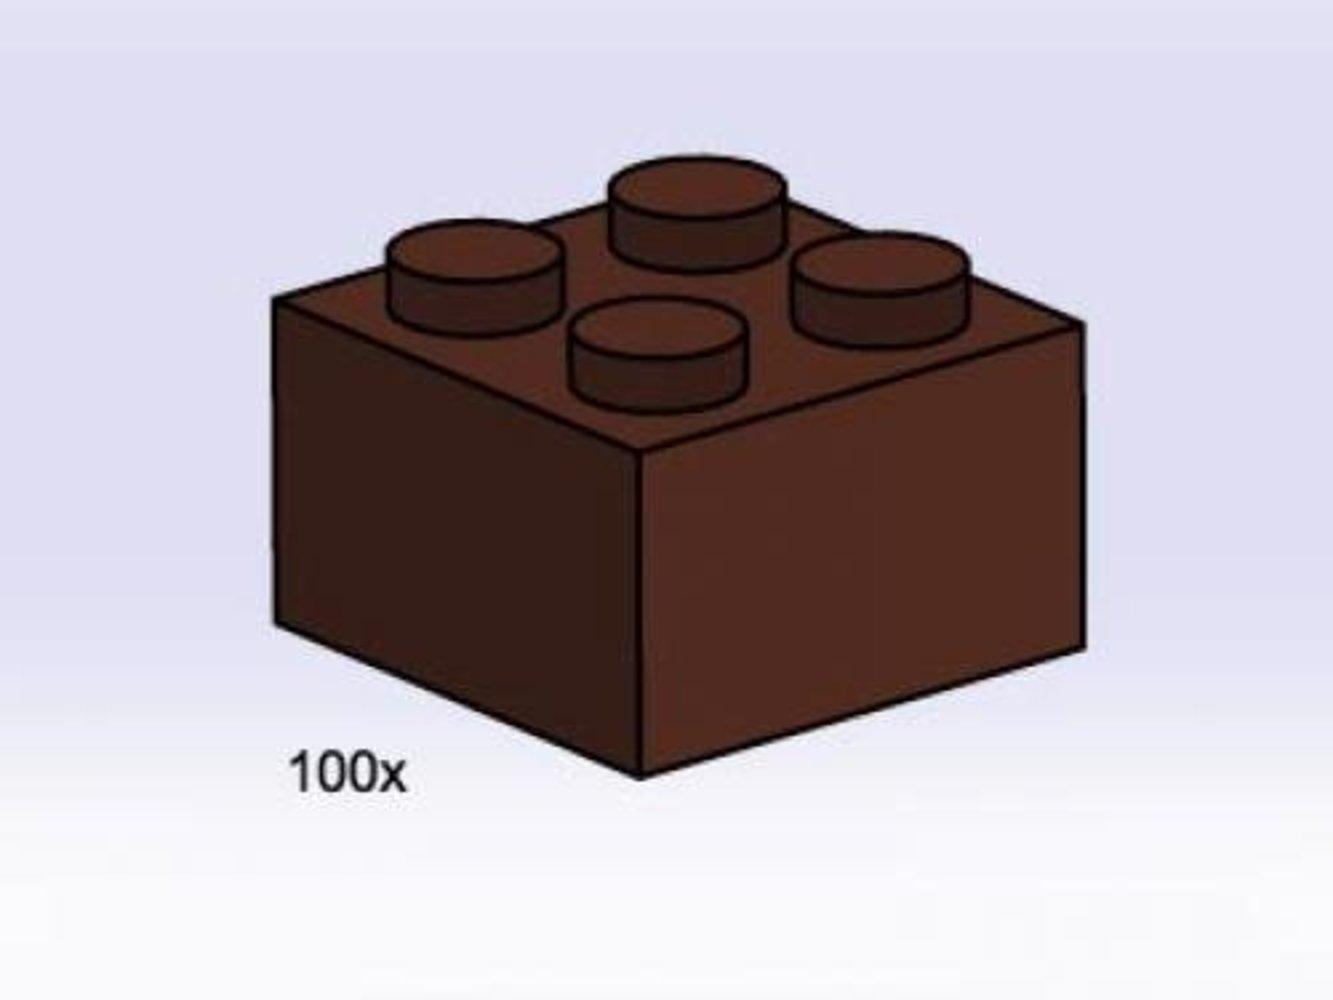 2 x 2 Brown Bricks